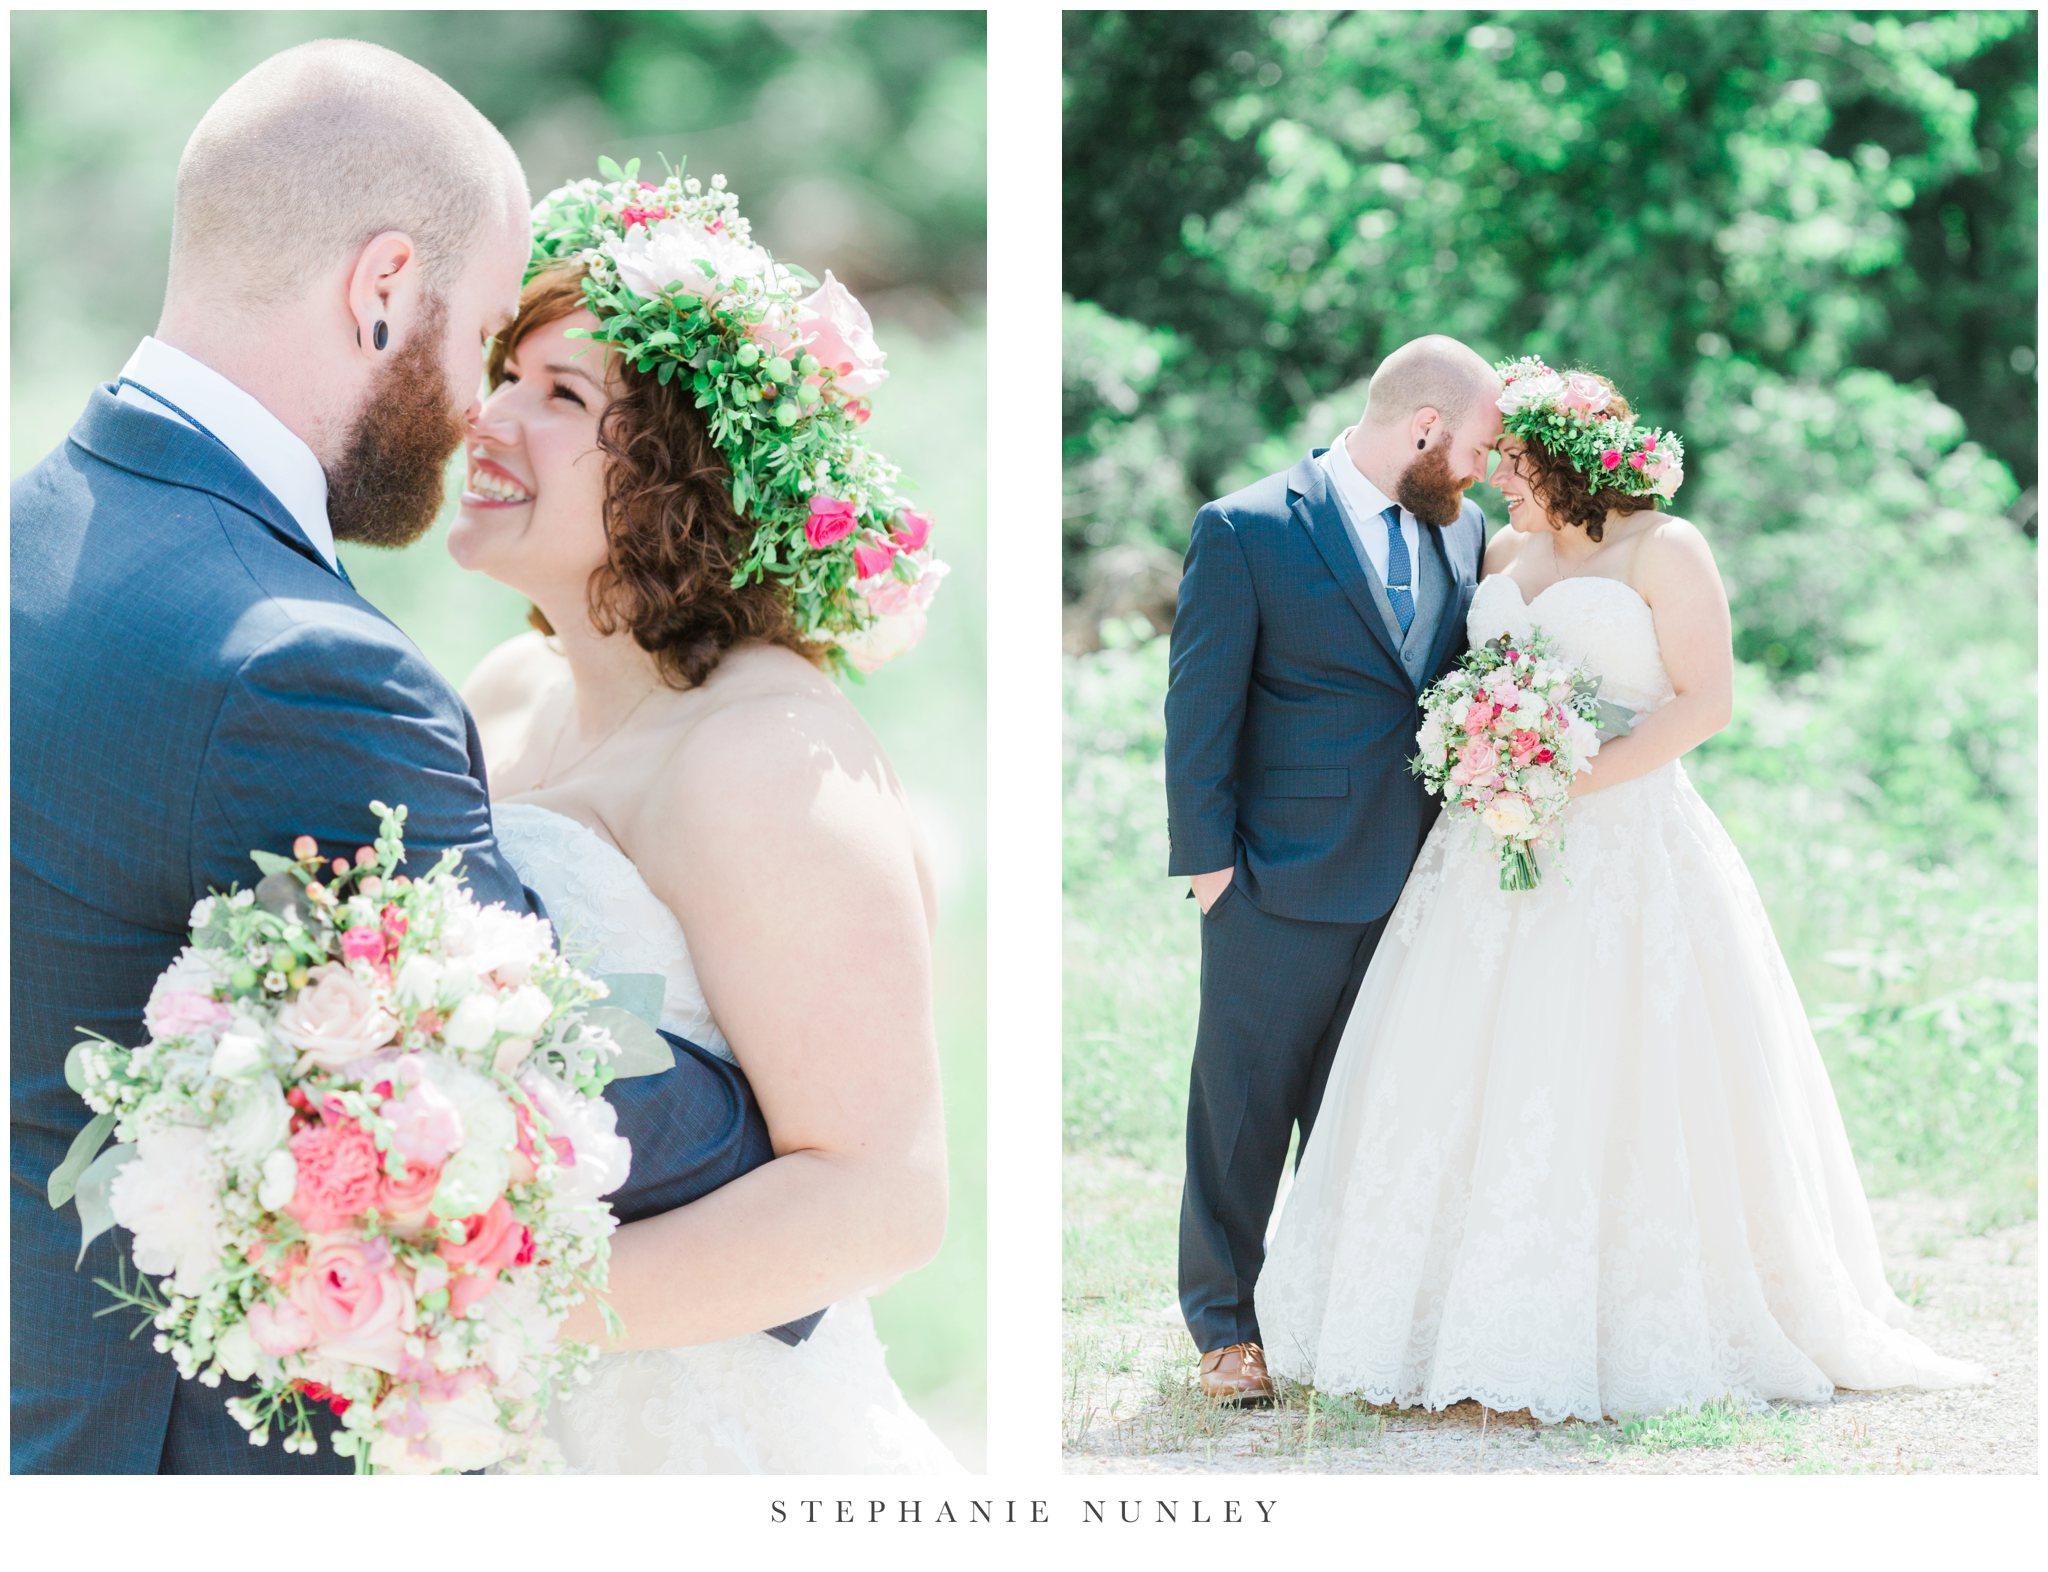 romantic-outdoor-wedding-with-flower-crown-0036.jpg